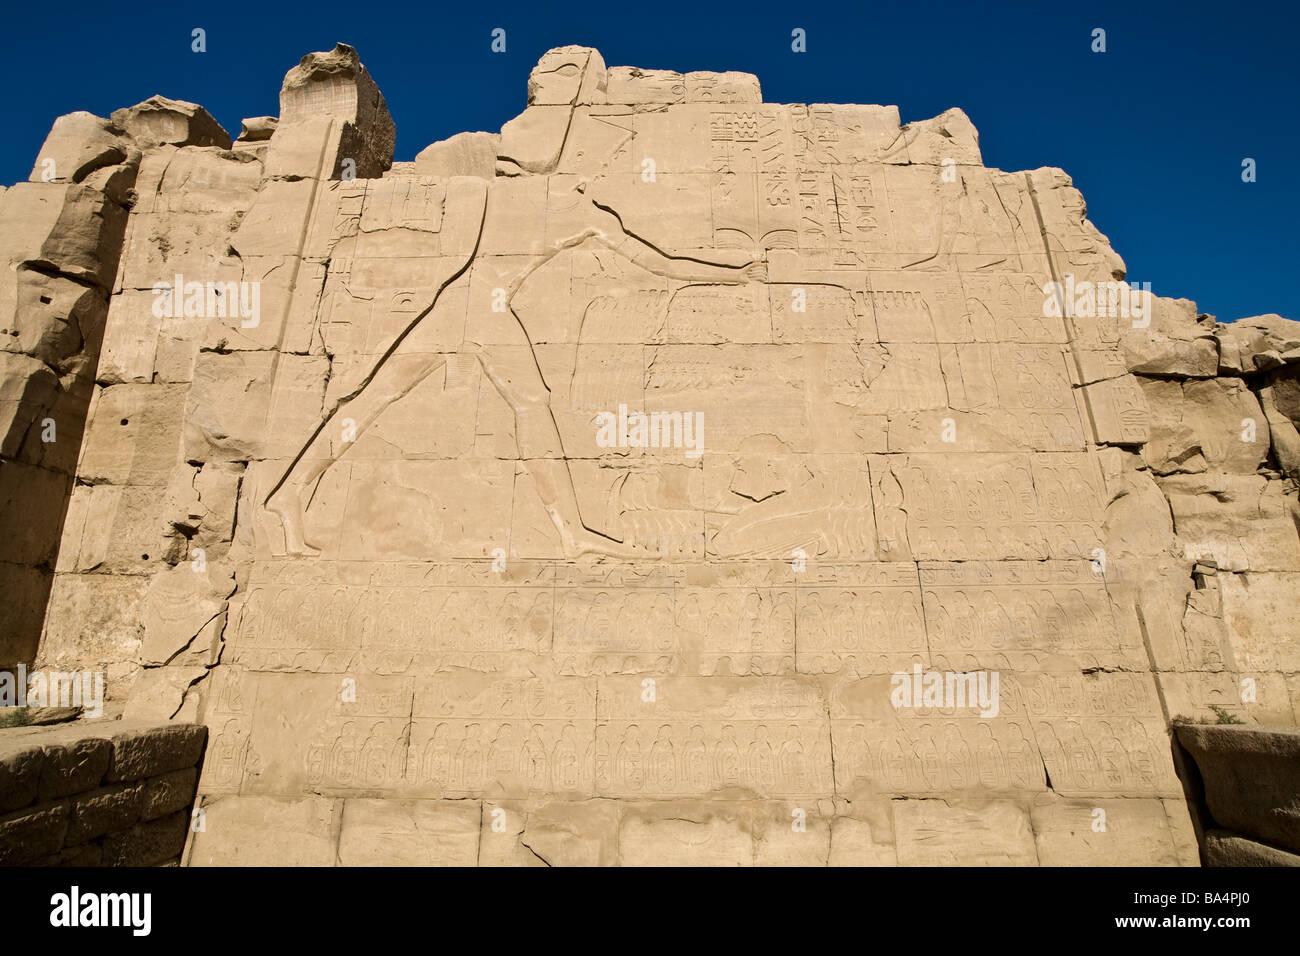 Relief of Pharaoh smiting his enemies at Karnak Temple, Luxor Egypt - Stock Image